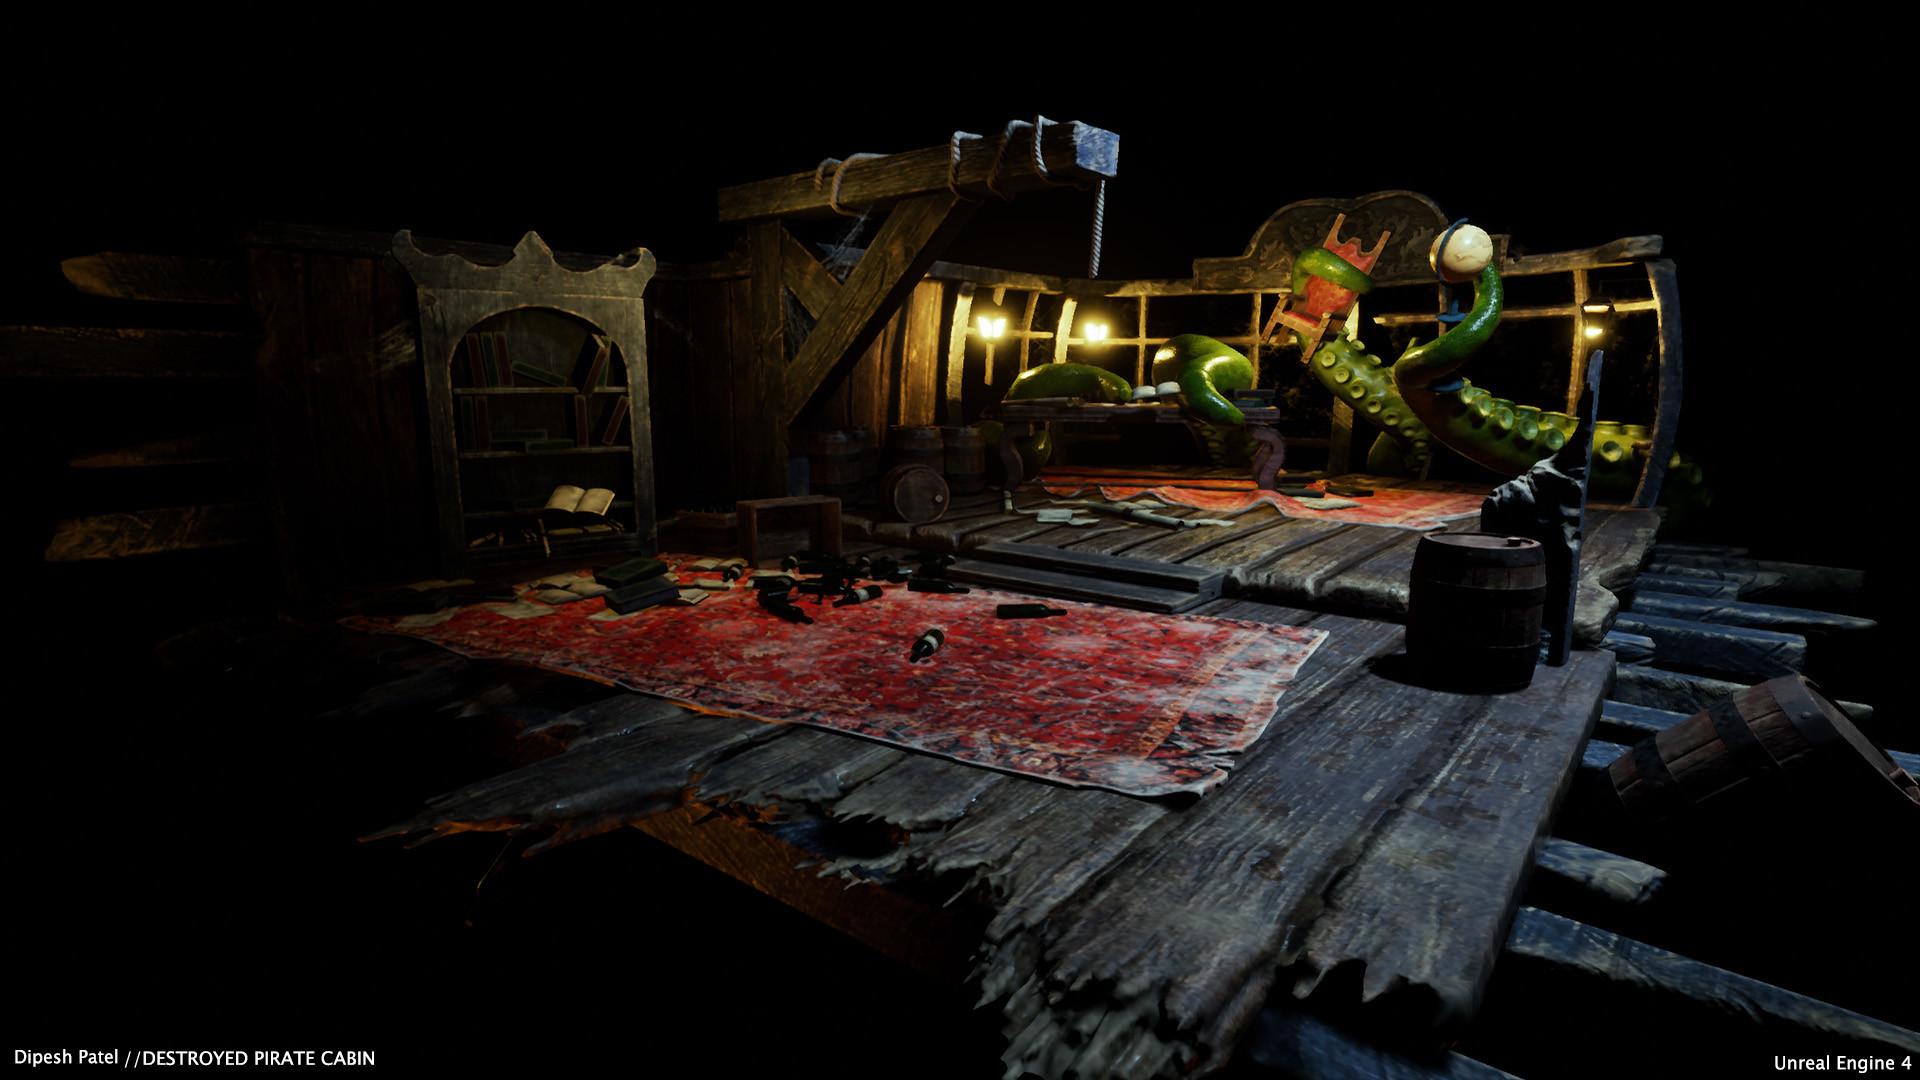 ArtStation - Pirate cabin diorama , Dipesh Patel